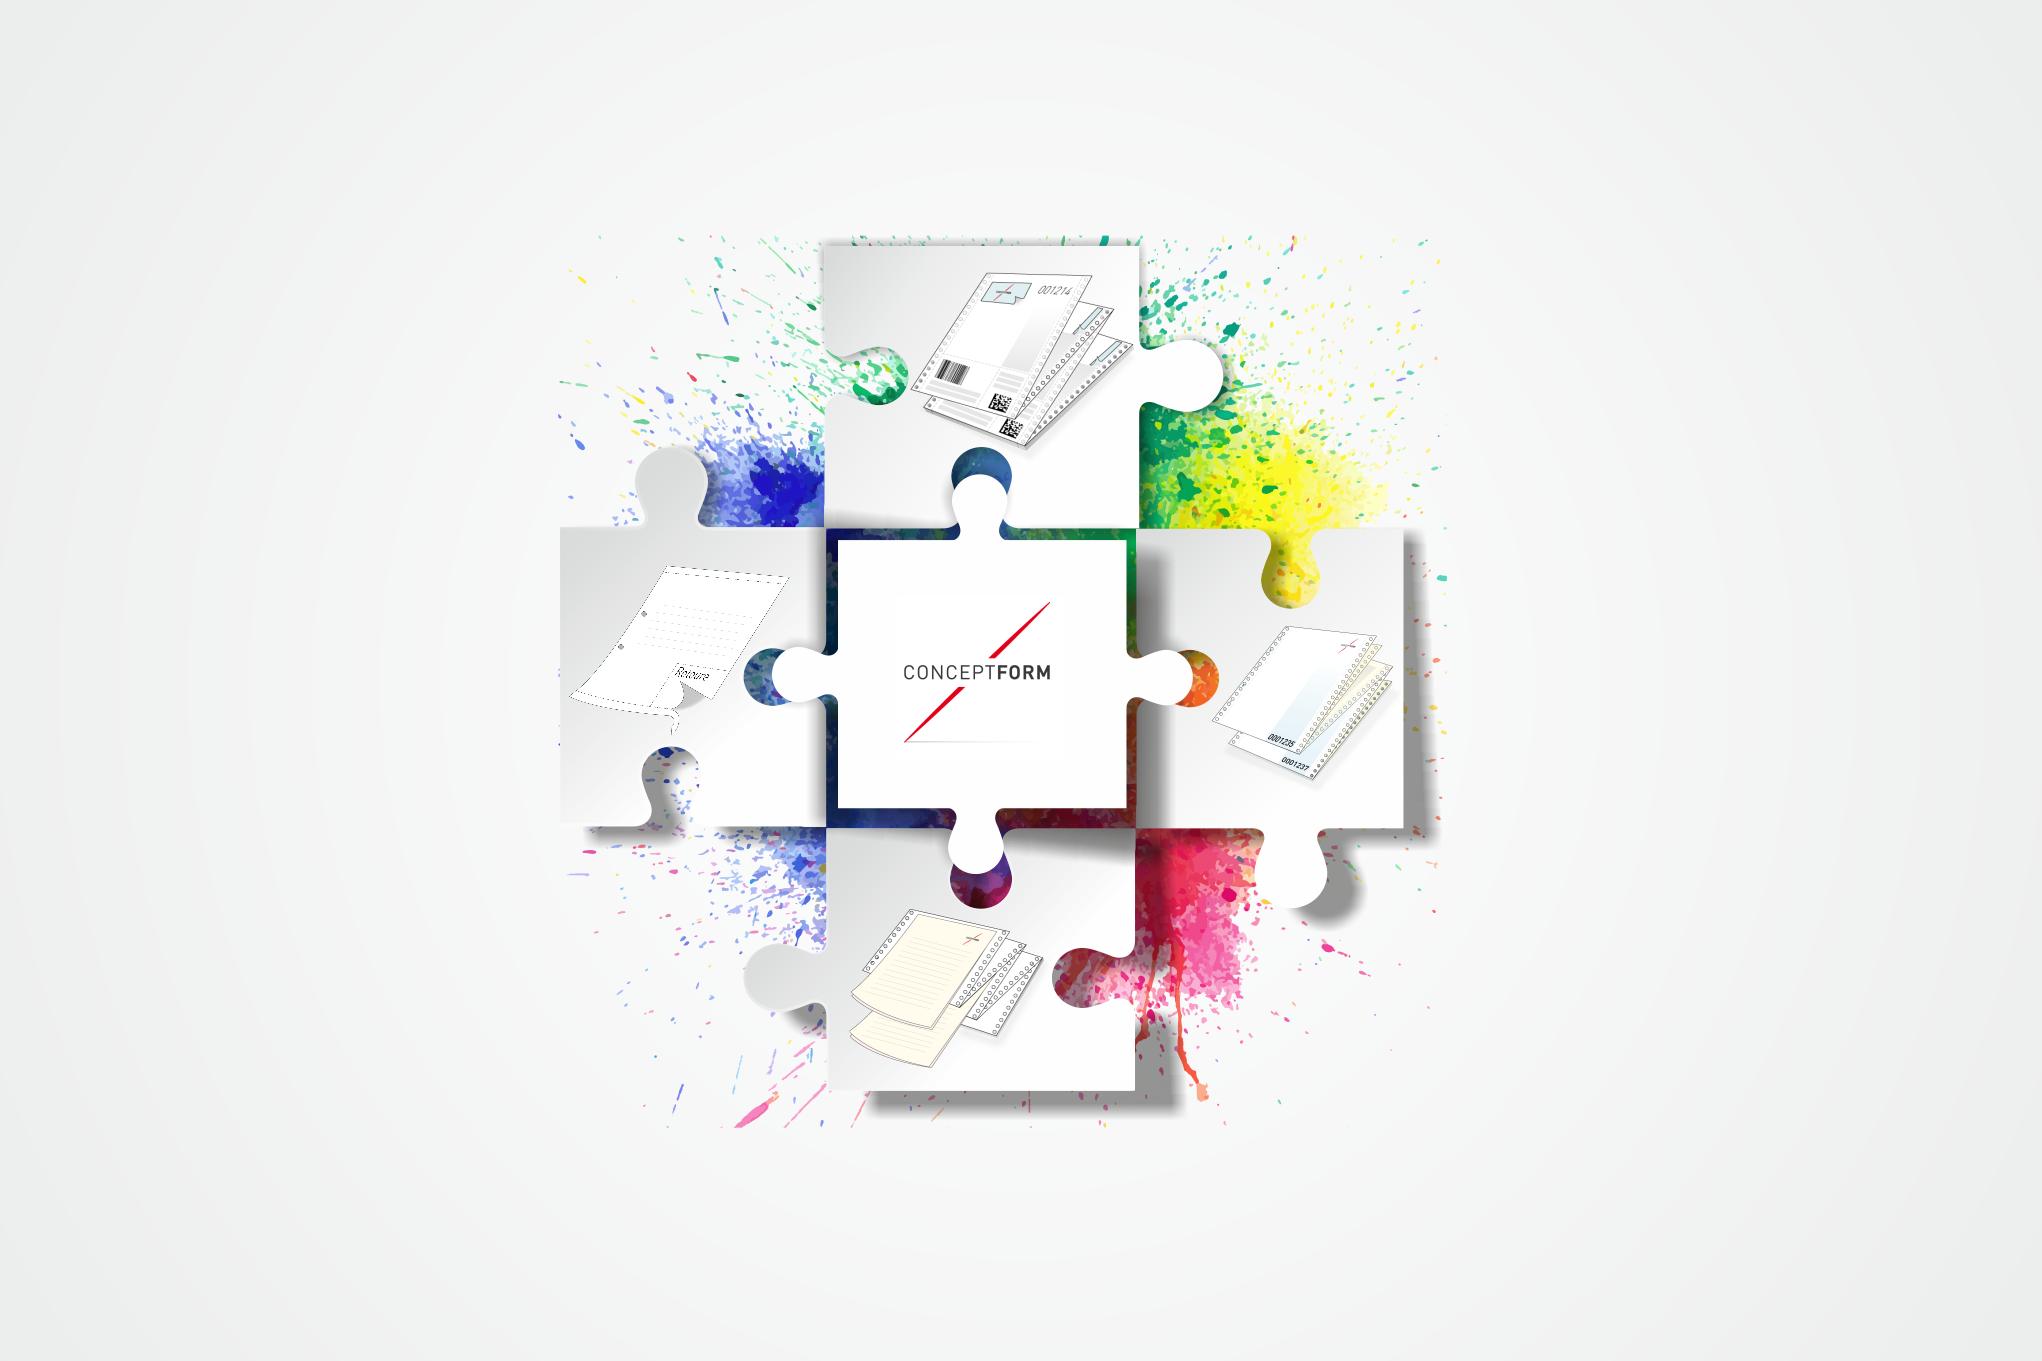 formulardruckerei-conceptformgmbh-portfolio